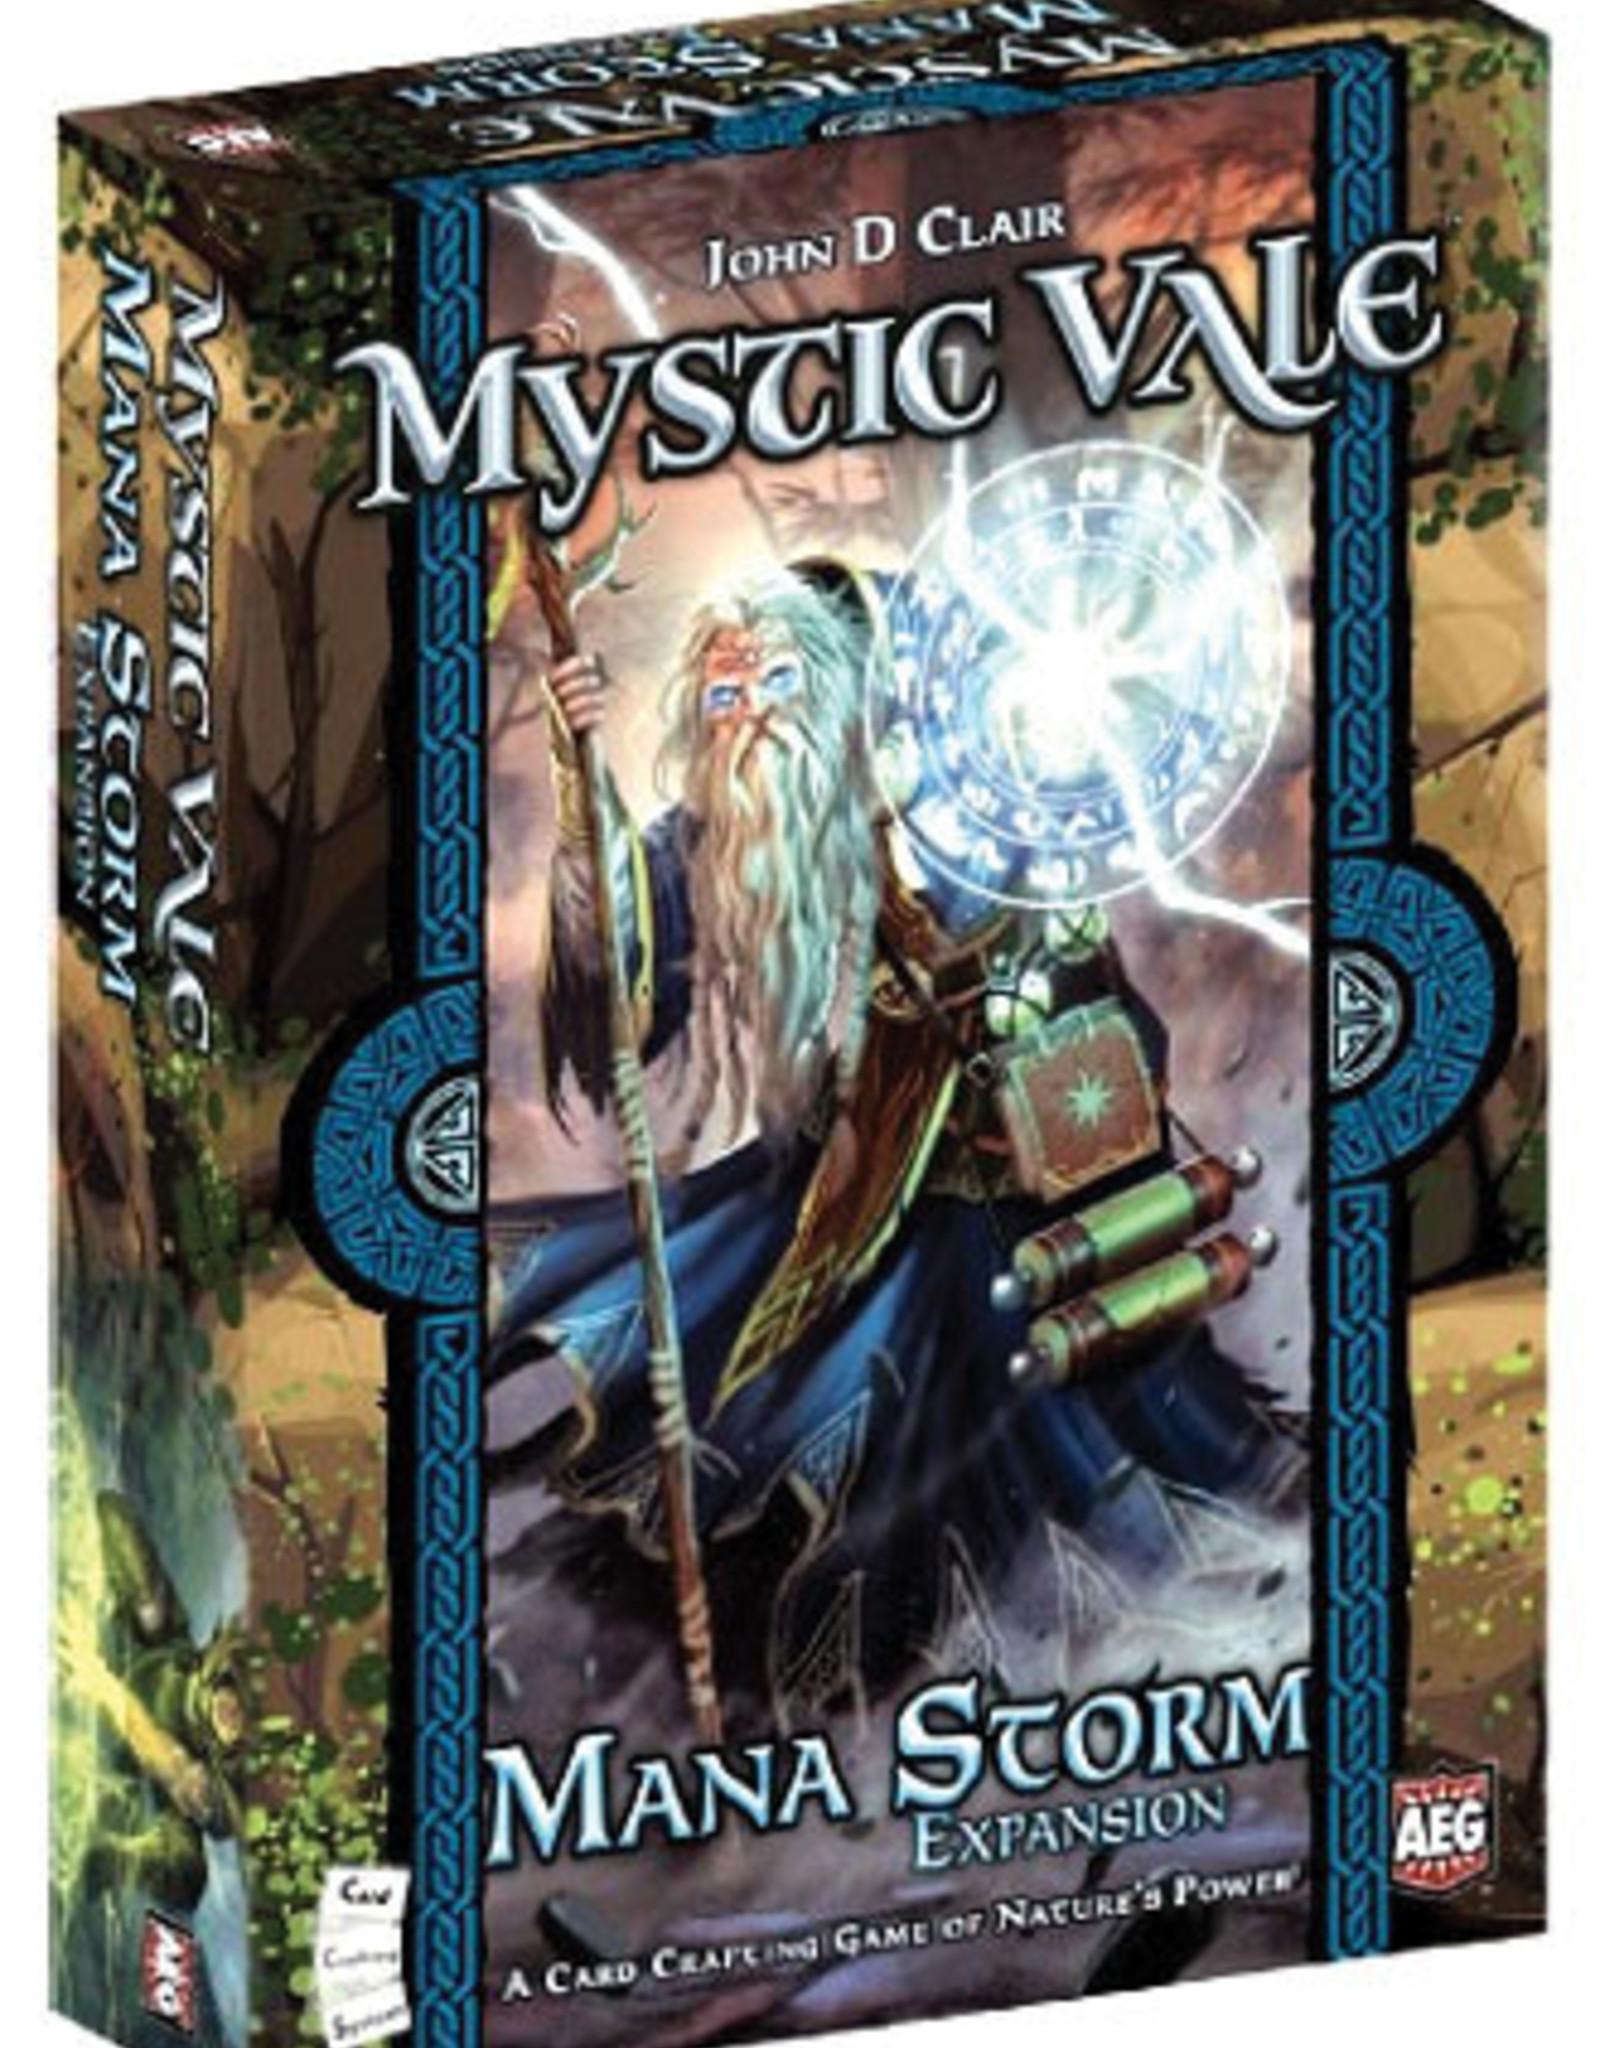 MYSTIC VALE EXP MANA STORM